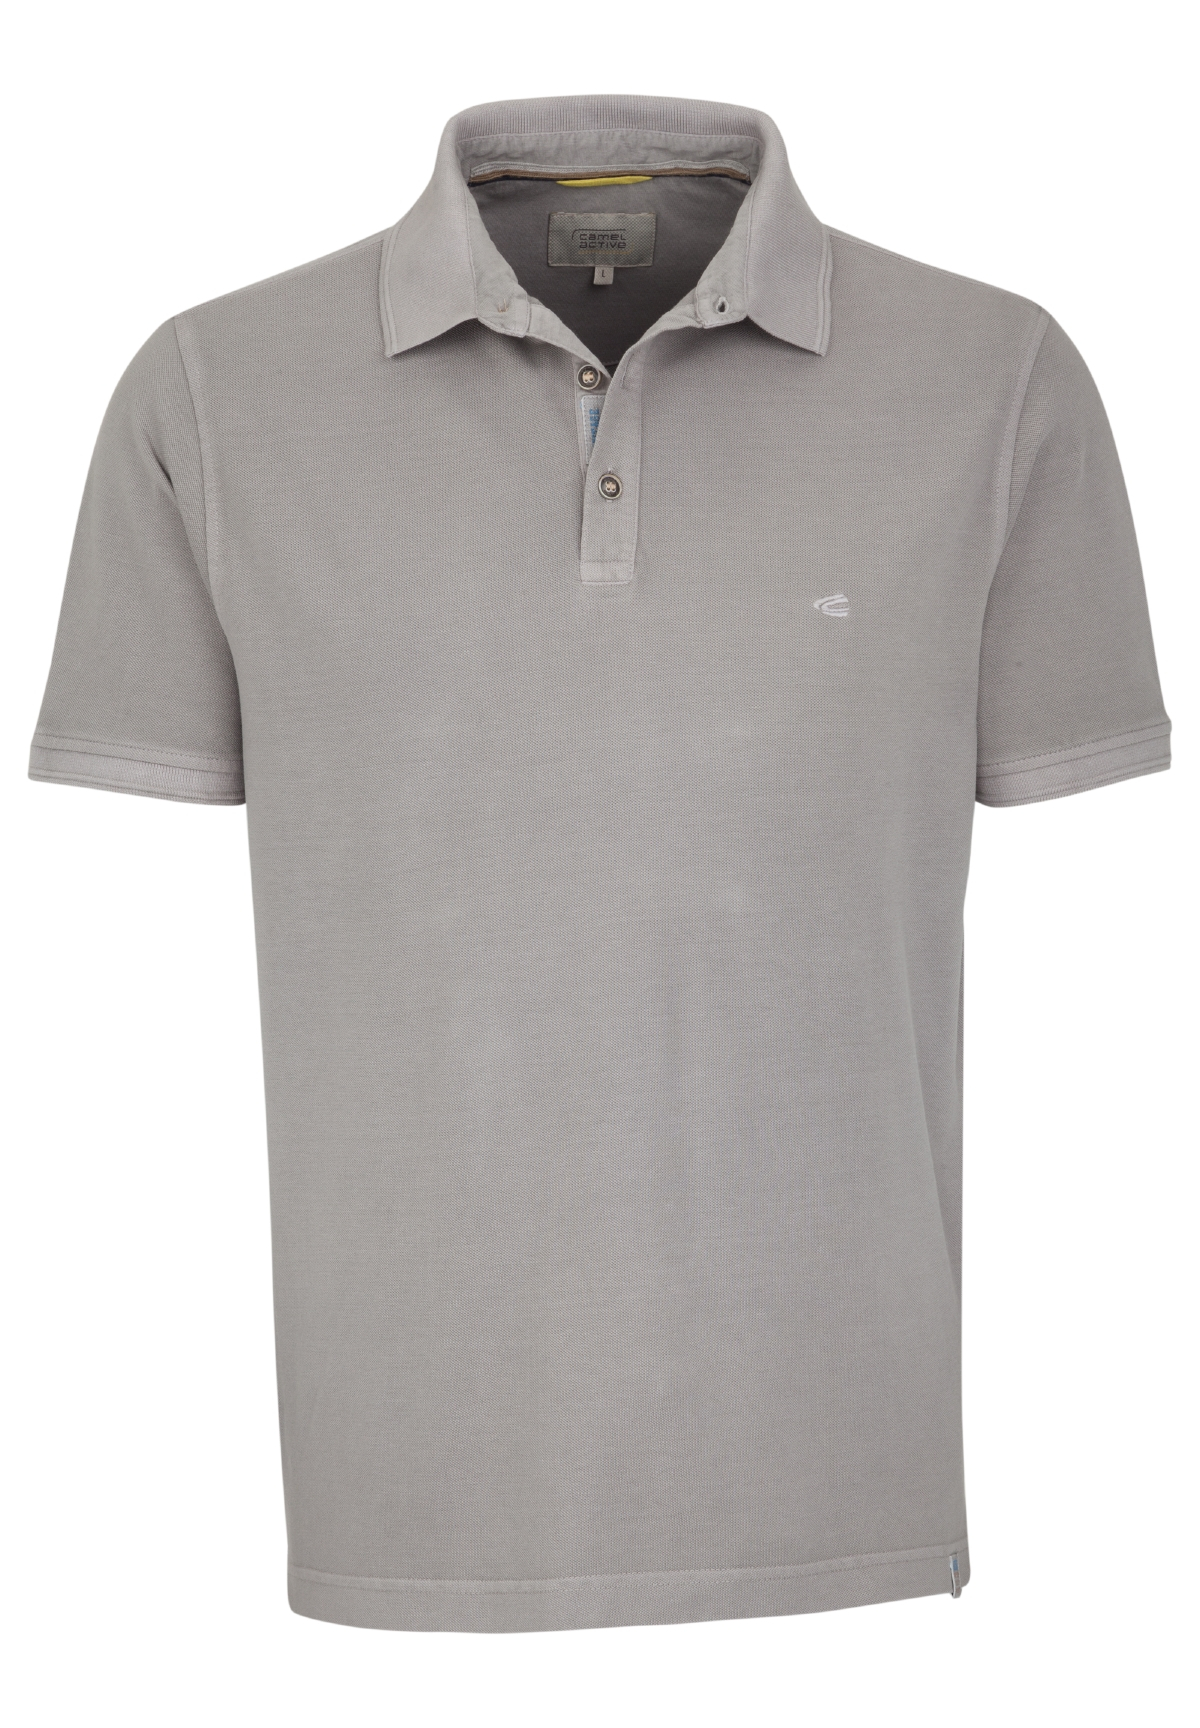 Camel-Active-Herren-Shirt-Poloshirt-Pique-Regular-Fit-NEU Indexbild 37